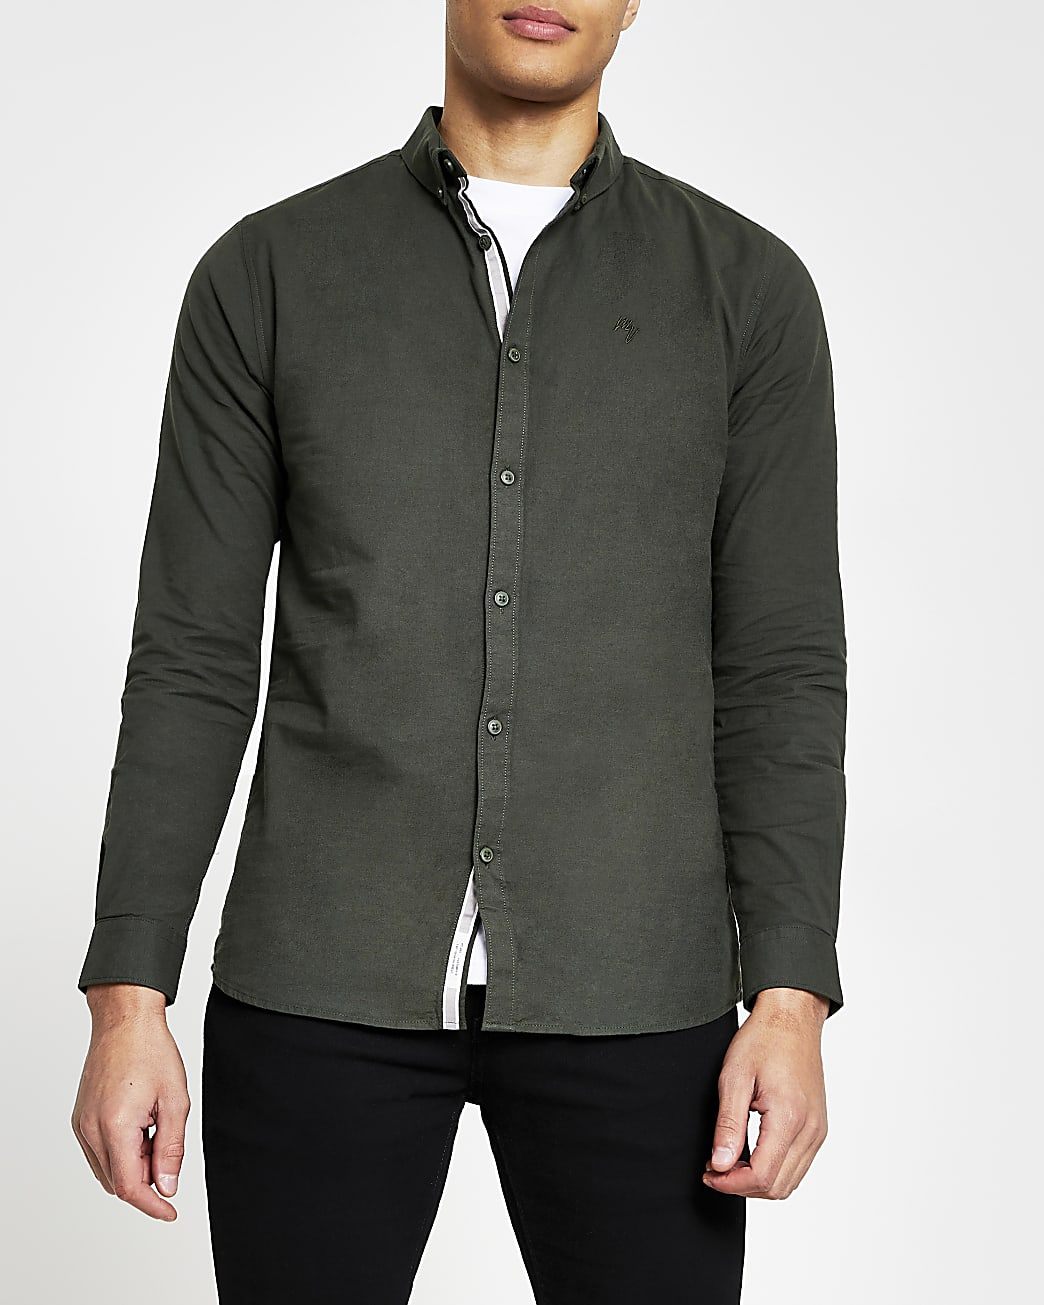 Khaki muscle fit long sleeve oxford shirt